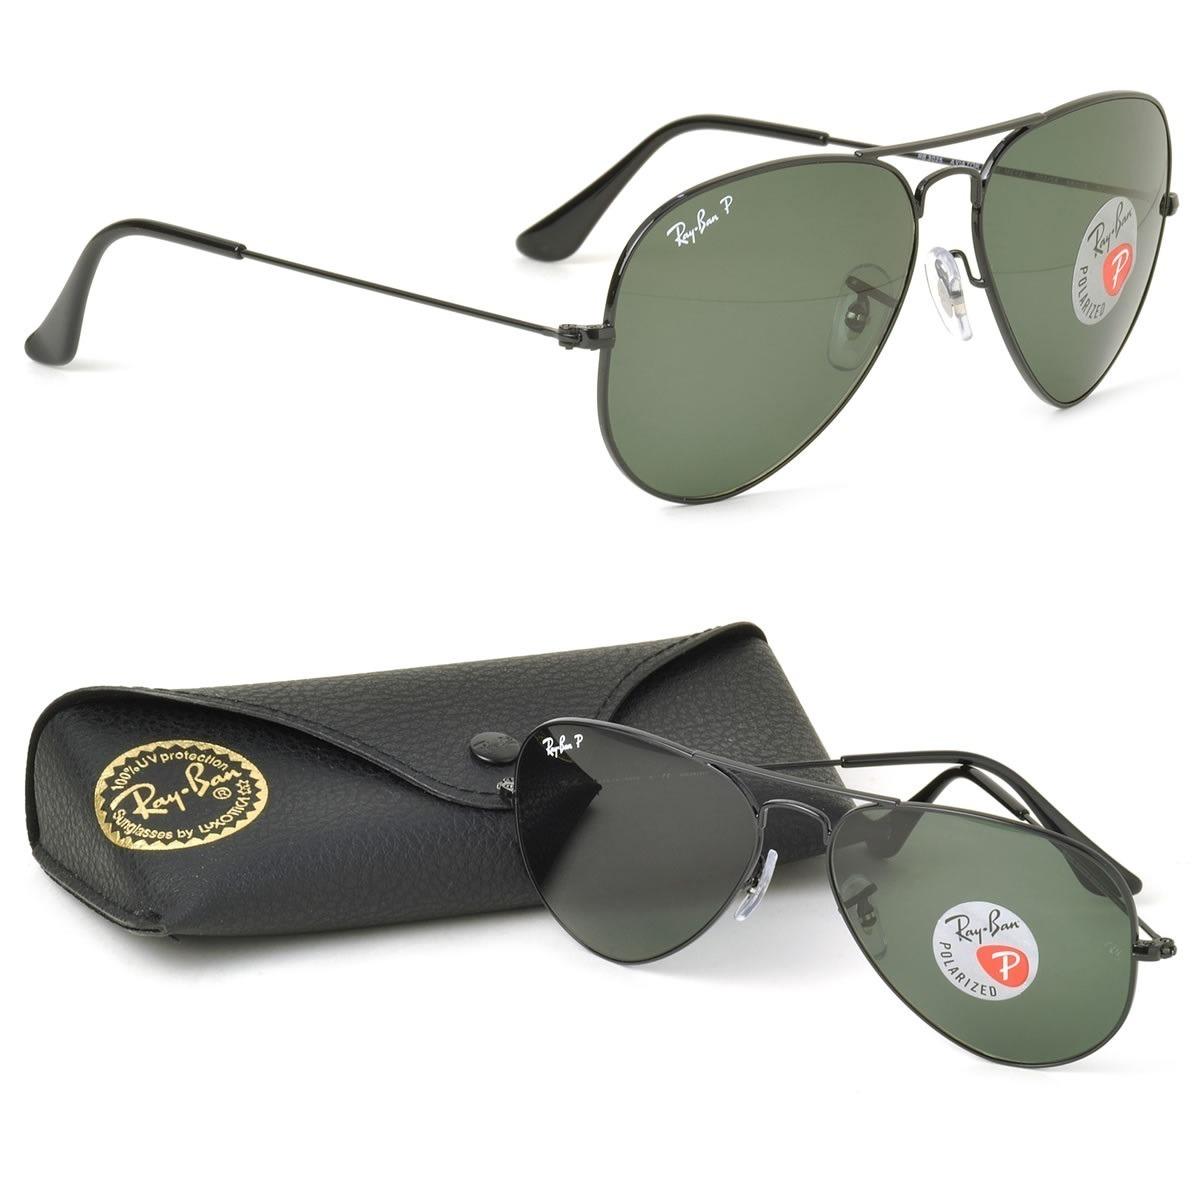 oculos de sol aviador polarizado masculino feminino + brinde. Carregando  zoom. 3927b1332a